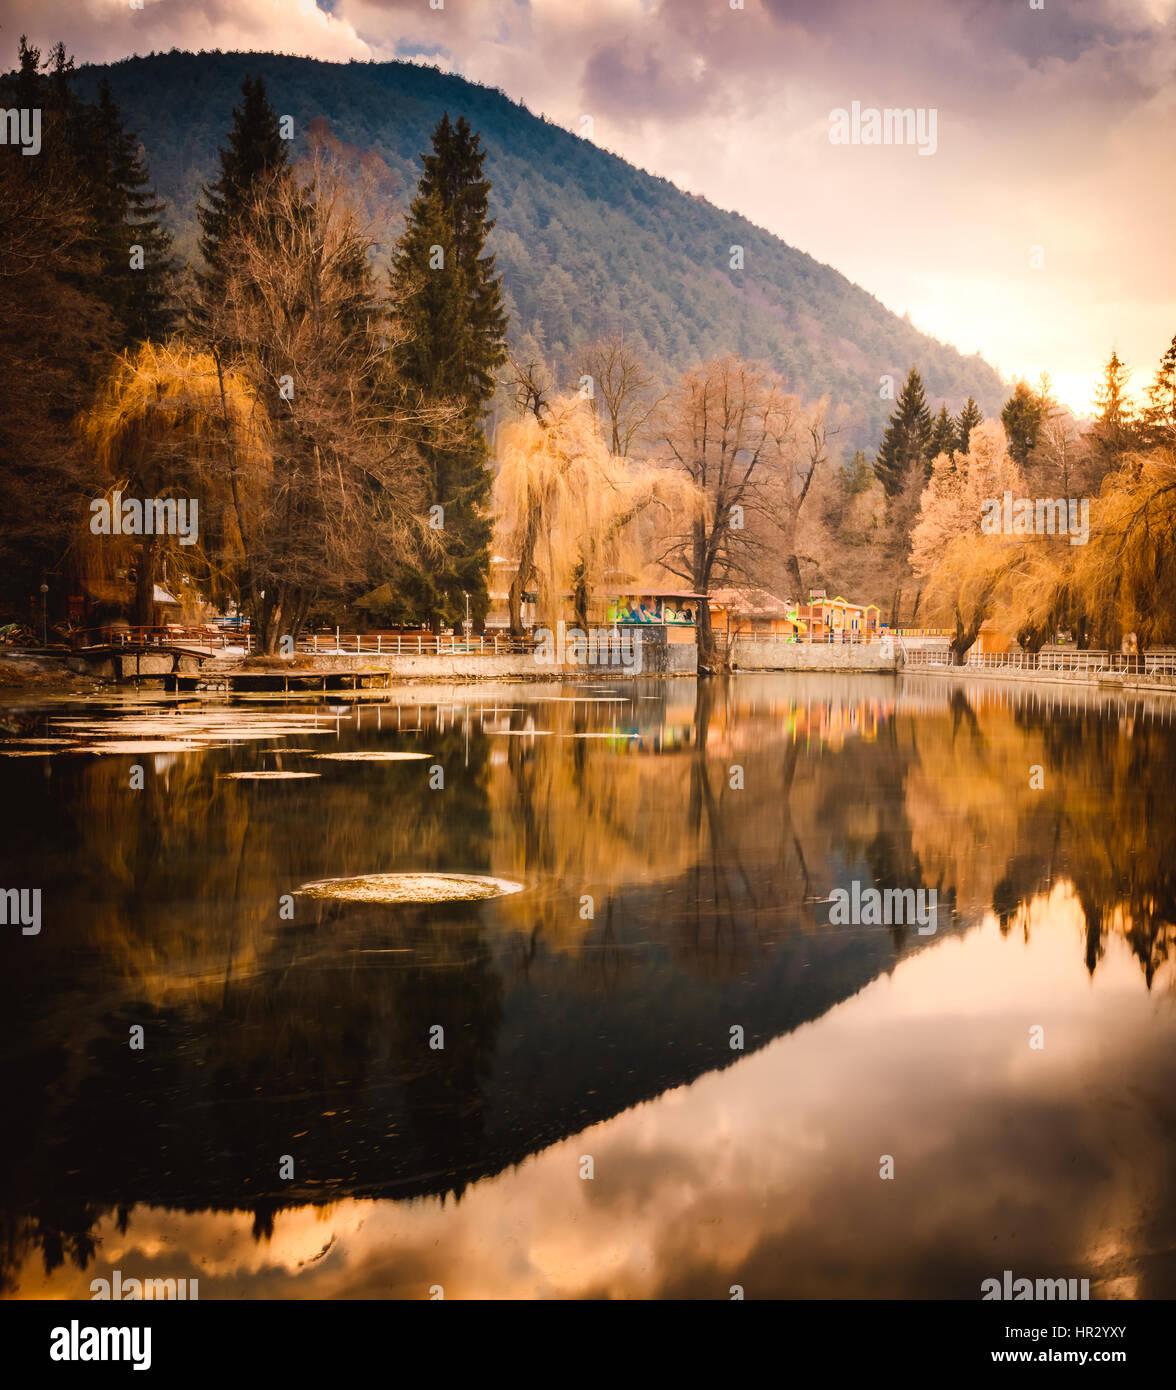 Velingrad - spa capital of Balkans, Rhodope Mountains, Bulgaria - Stock Image